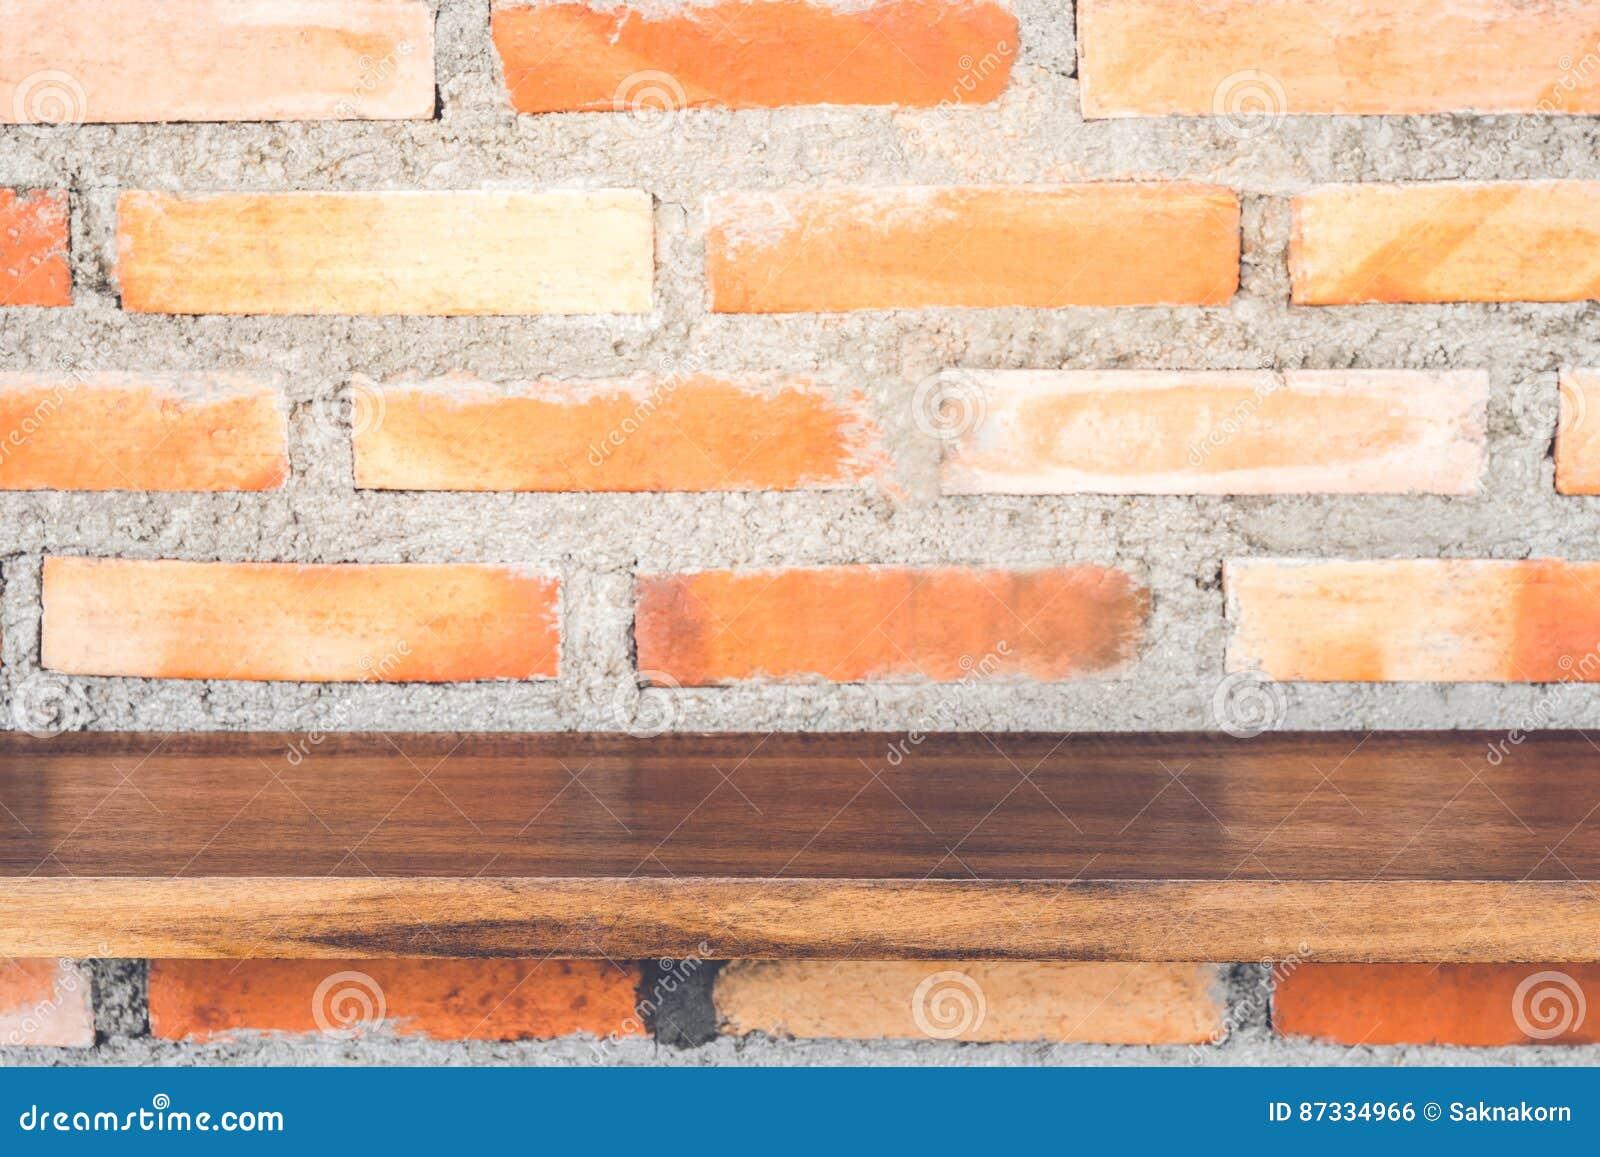 Empty Wood Shelf On Brick Wall Royalty Free Stock Photo